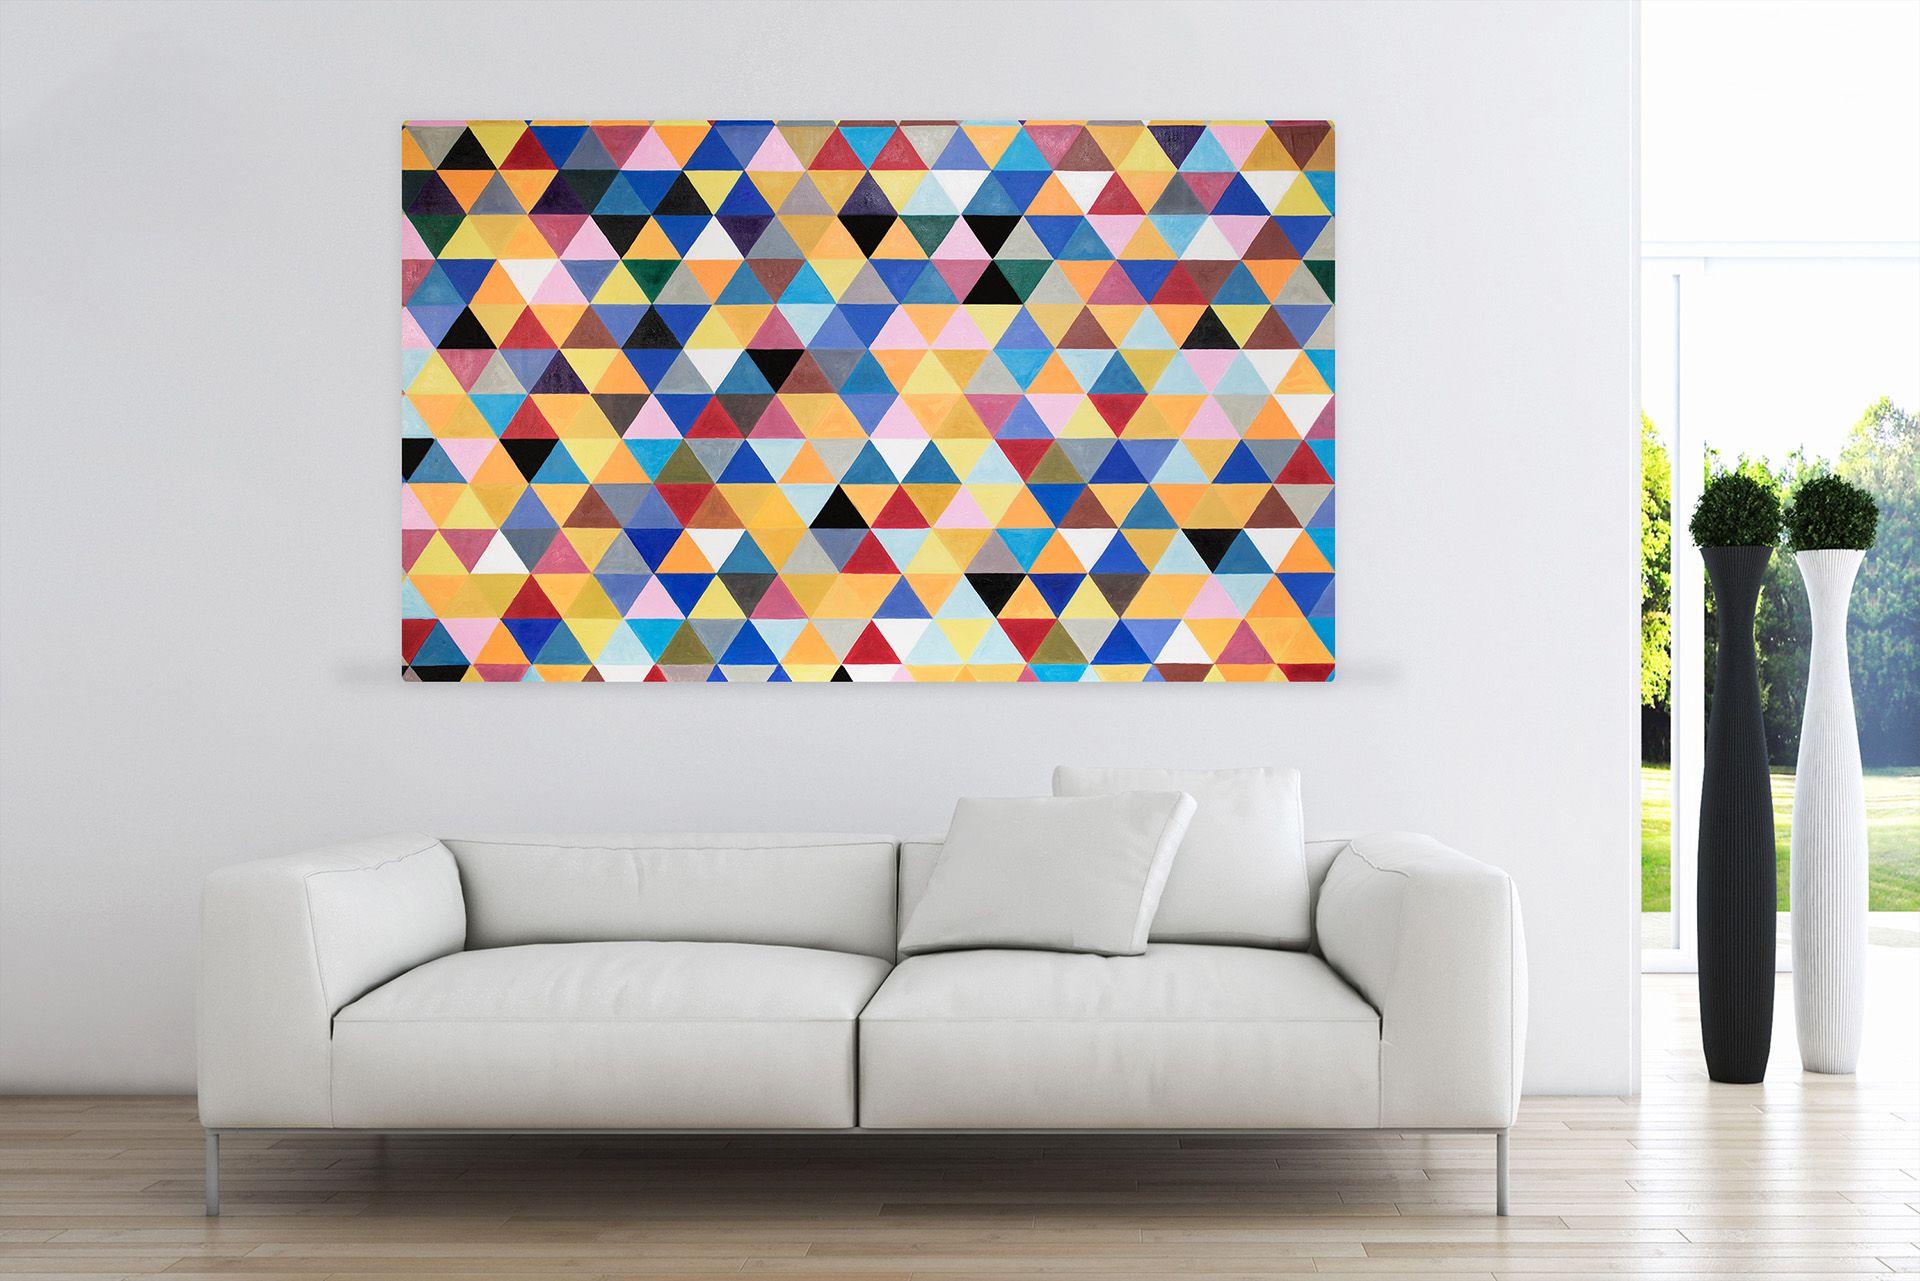 Öl Gemälde 'Vitales Assortiment' 165x100cm